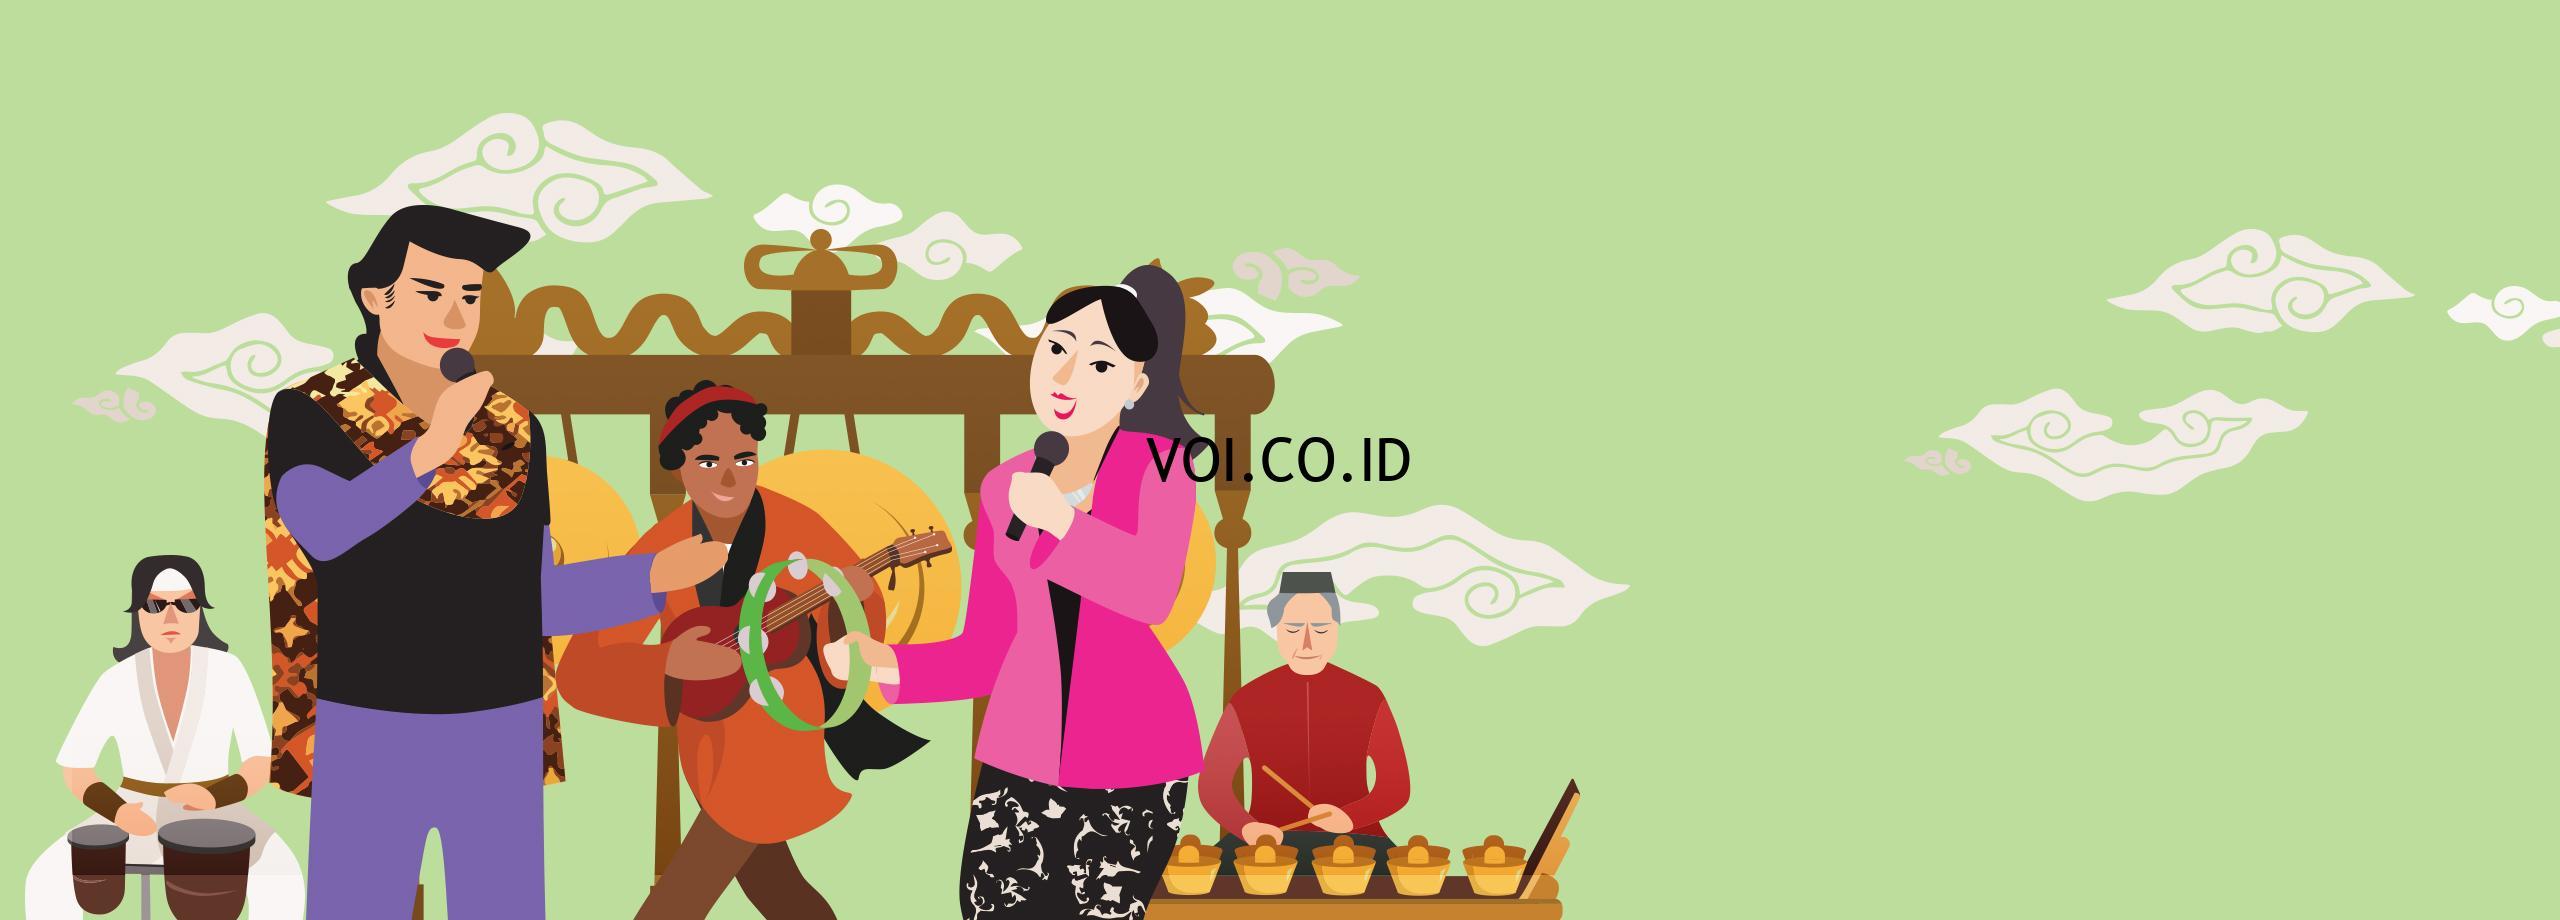 Pengertian Kebudayaan Berdasarkan Bahasa